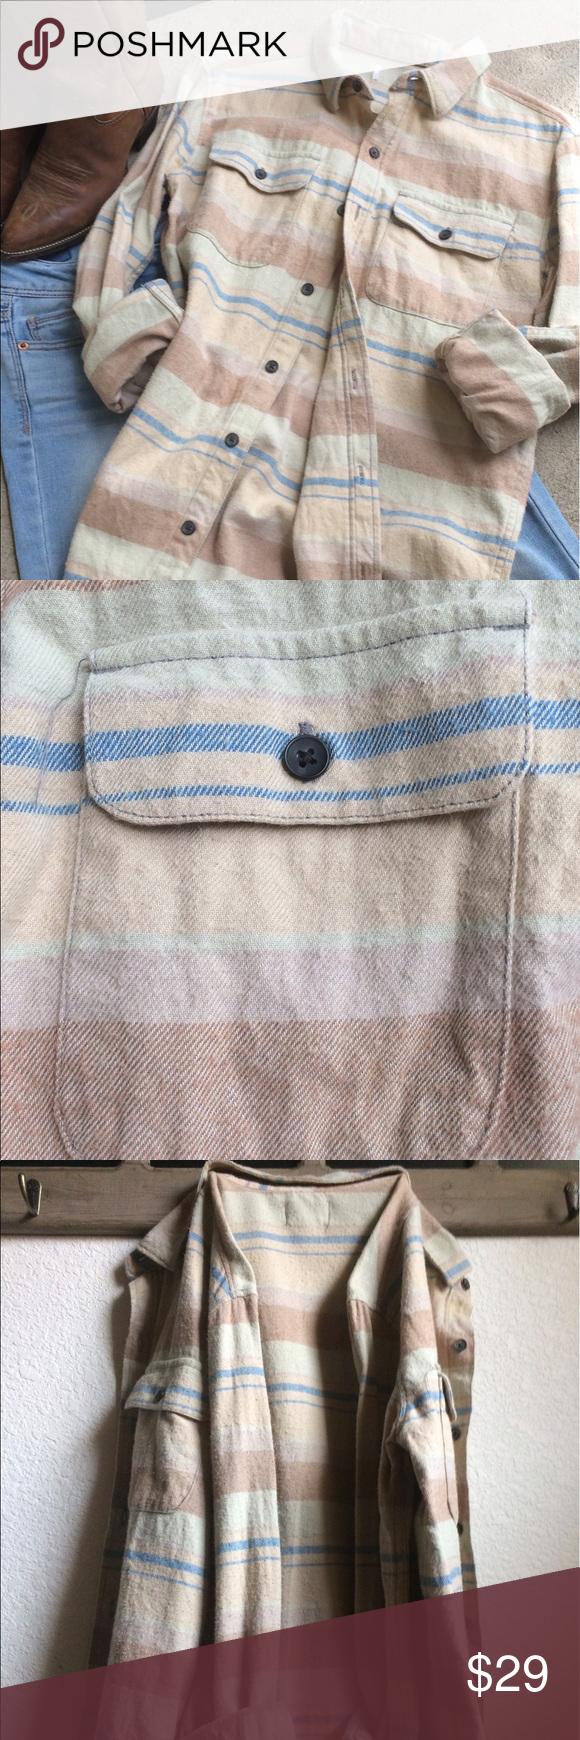 Flannel shirt with khaki pants  Sun Kissed